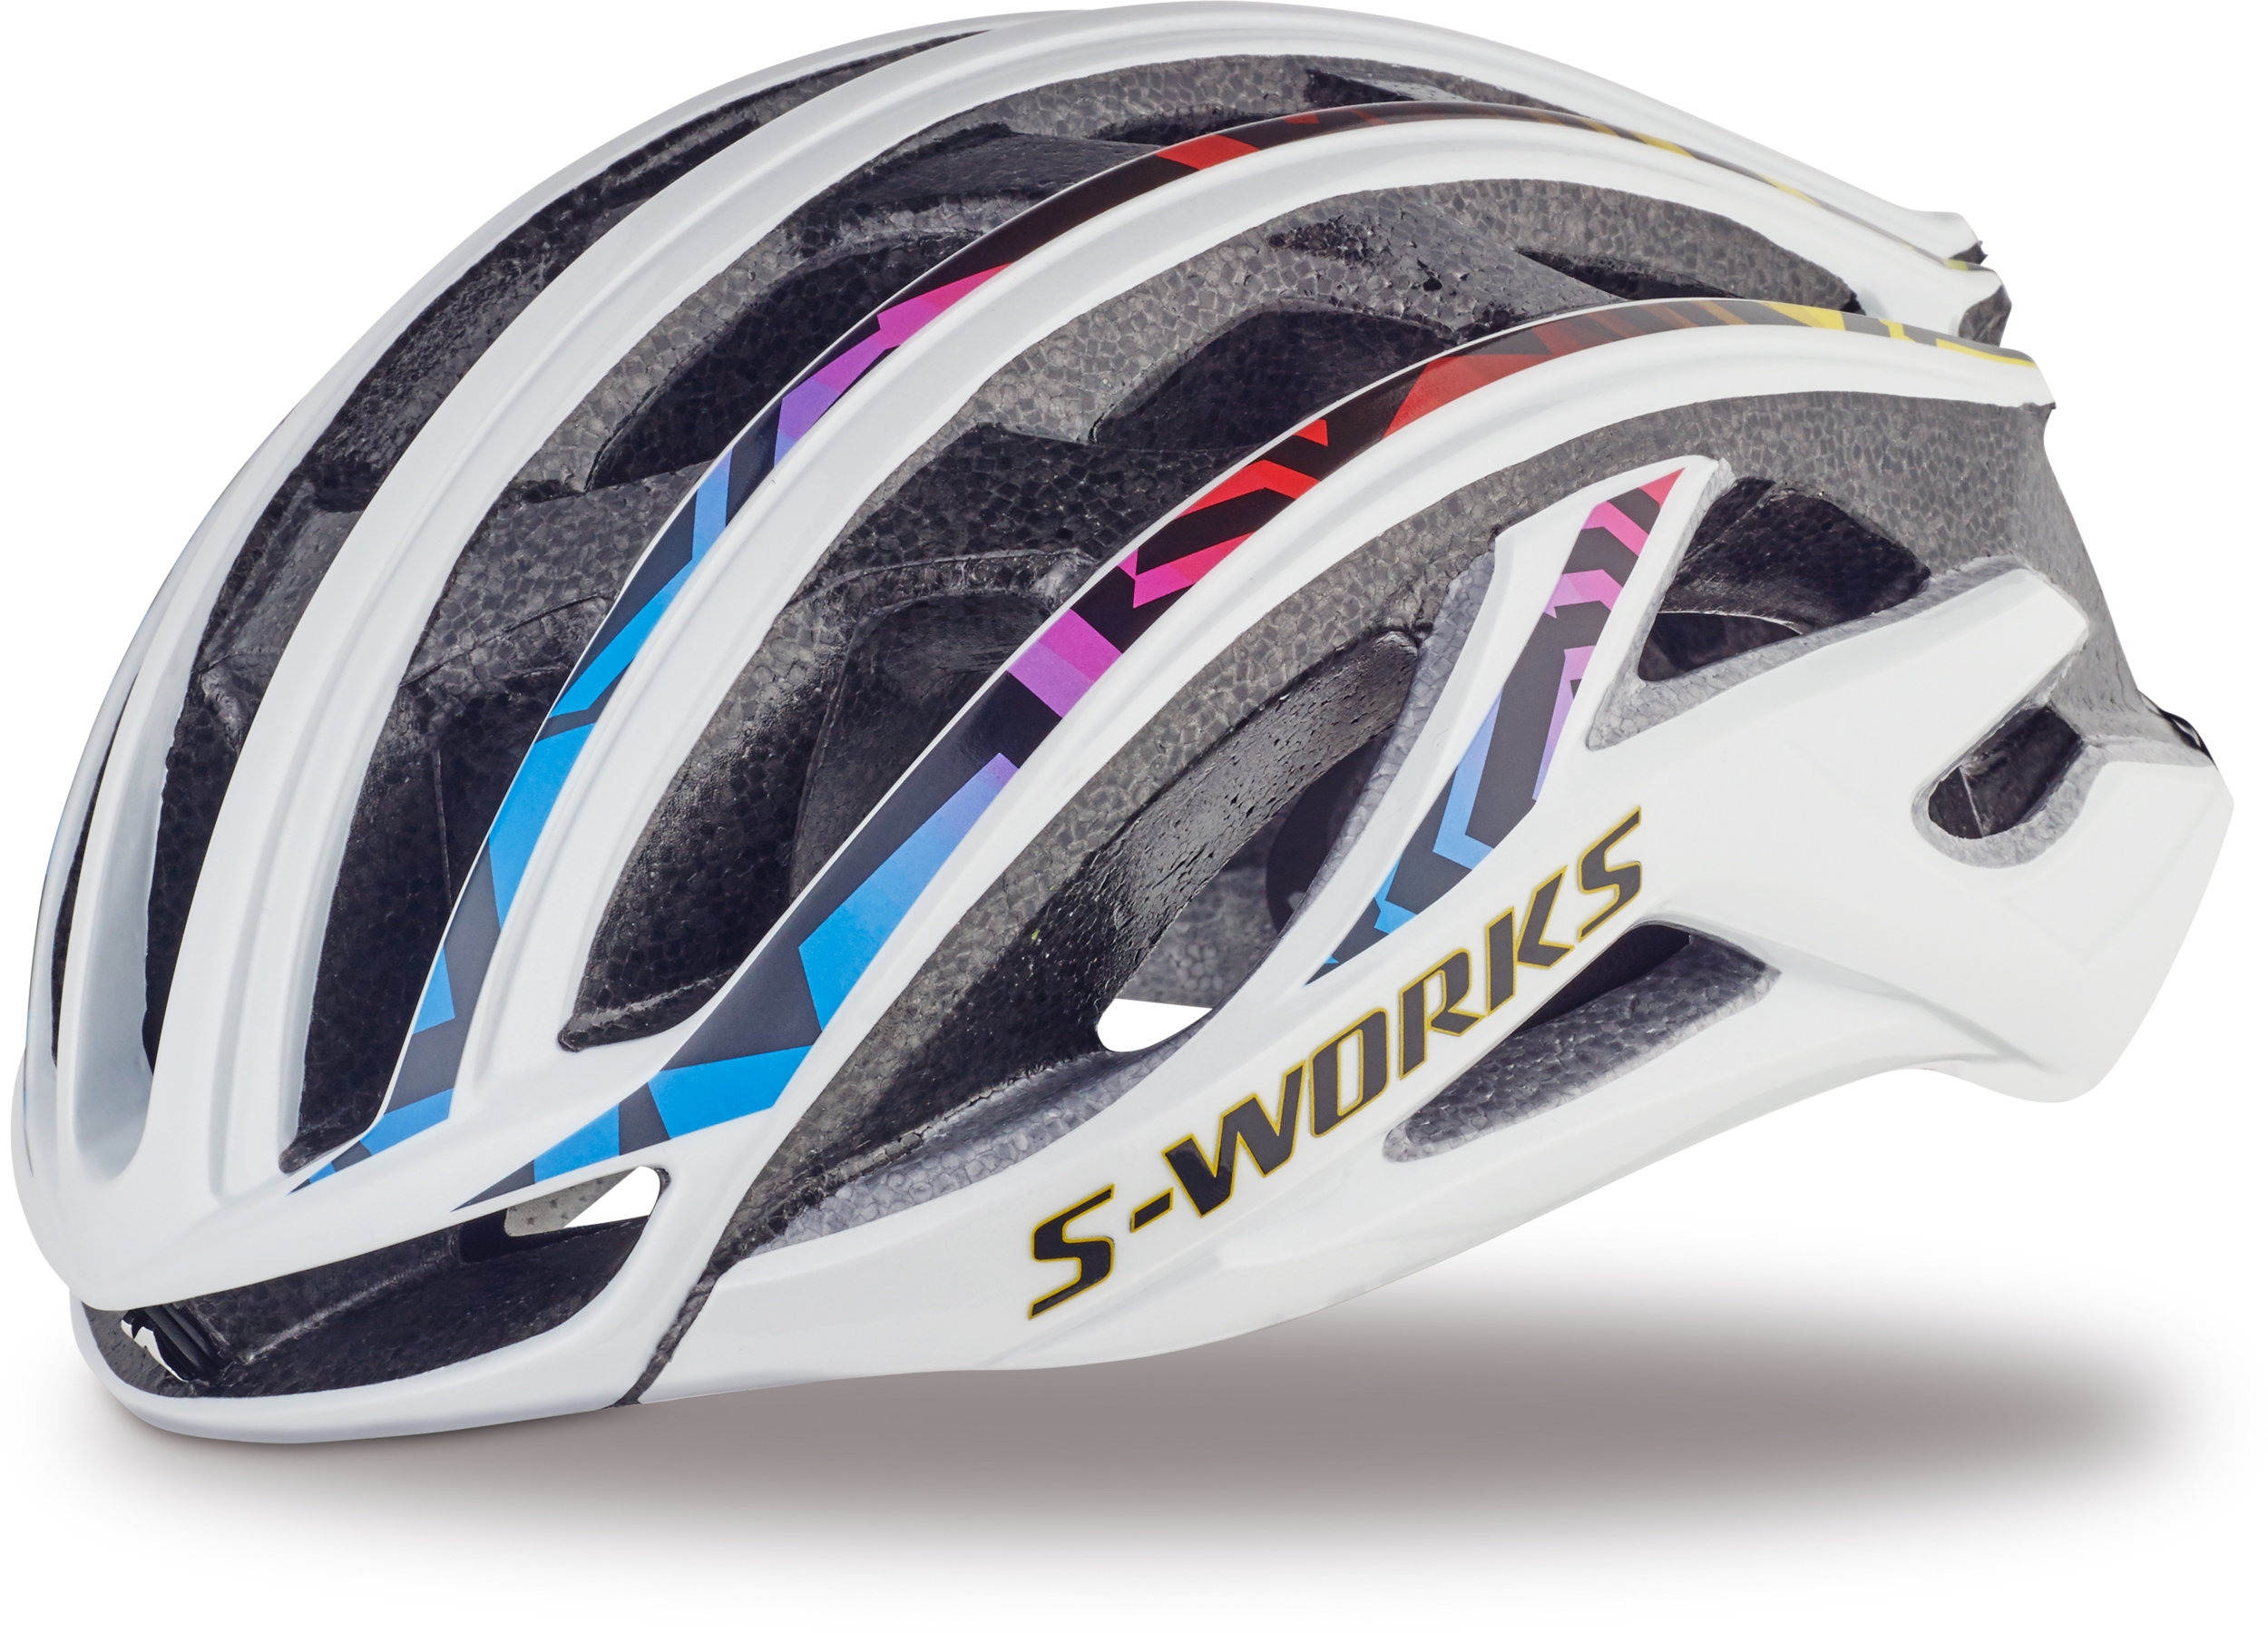 Specialized S-Works Prevail II Team World Champion M - Alpha Bikes